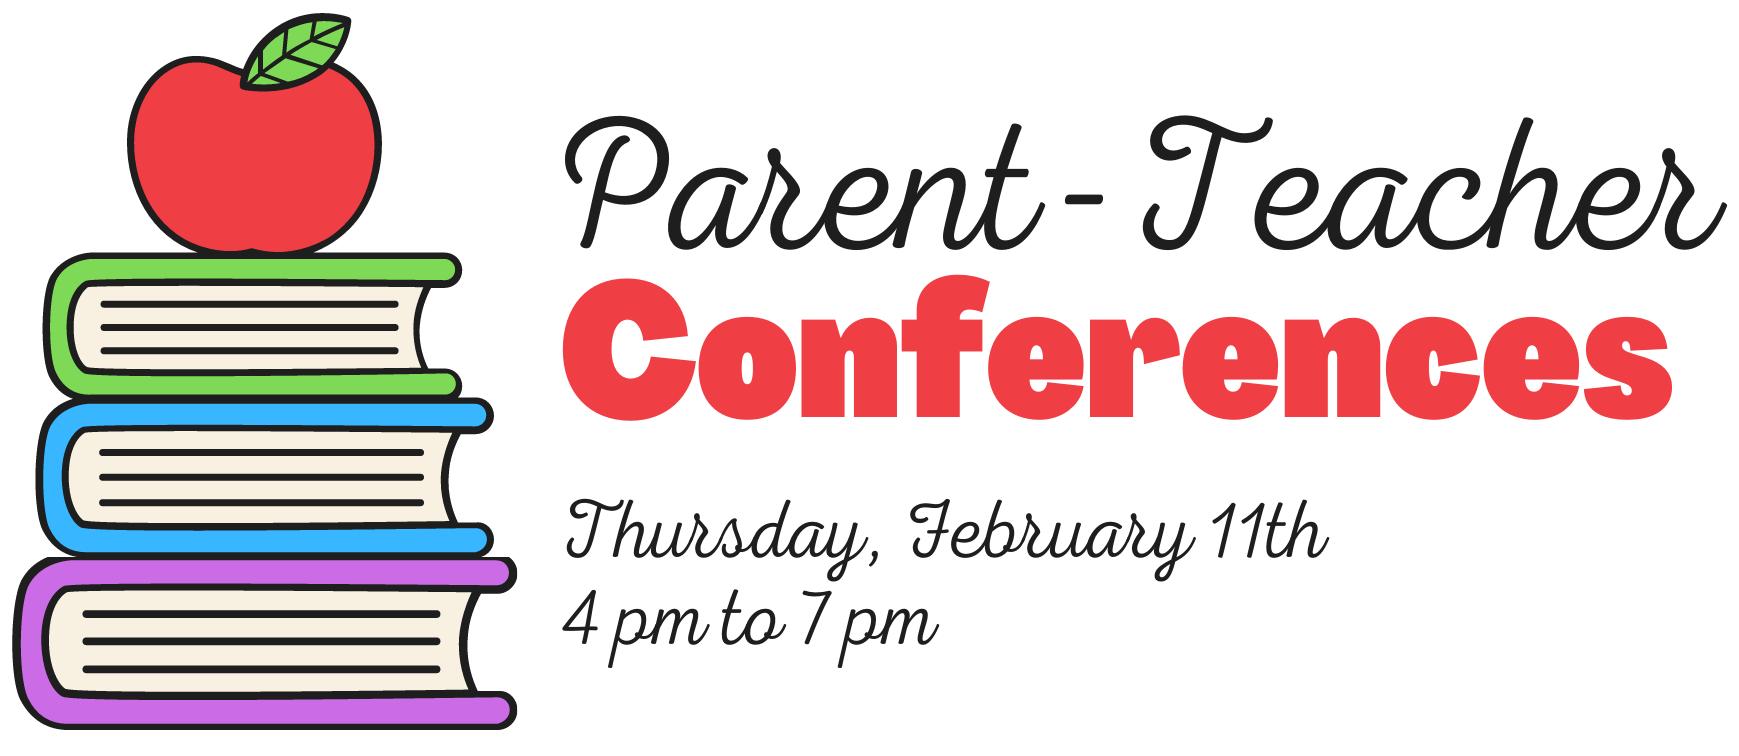 Conferences - Thursday, February 11, 4 -7